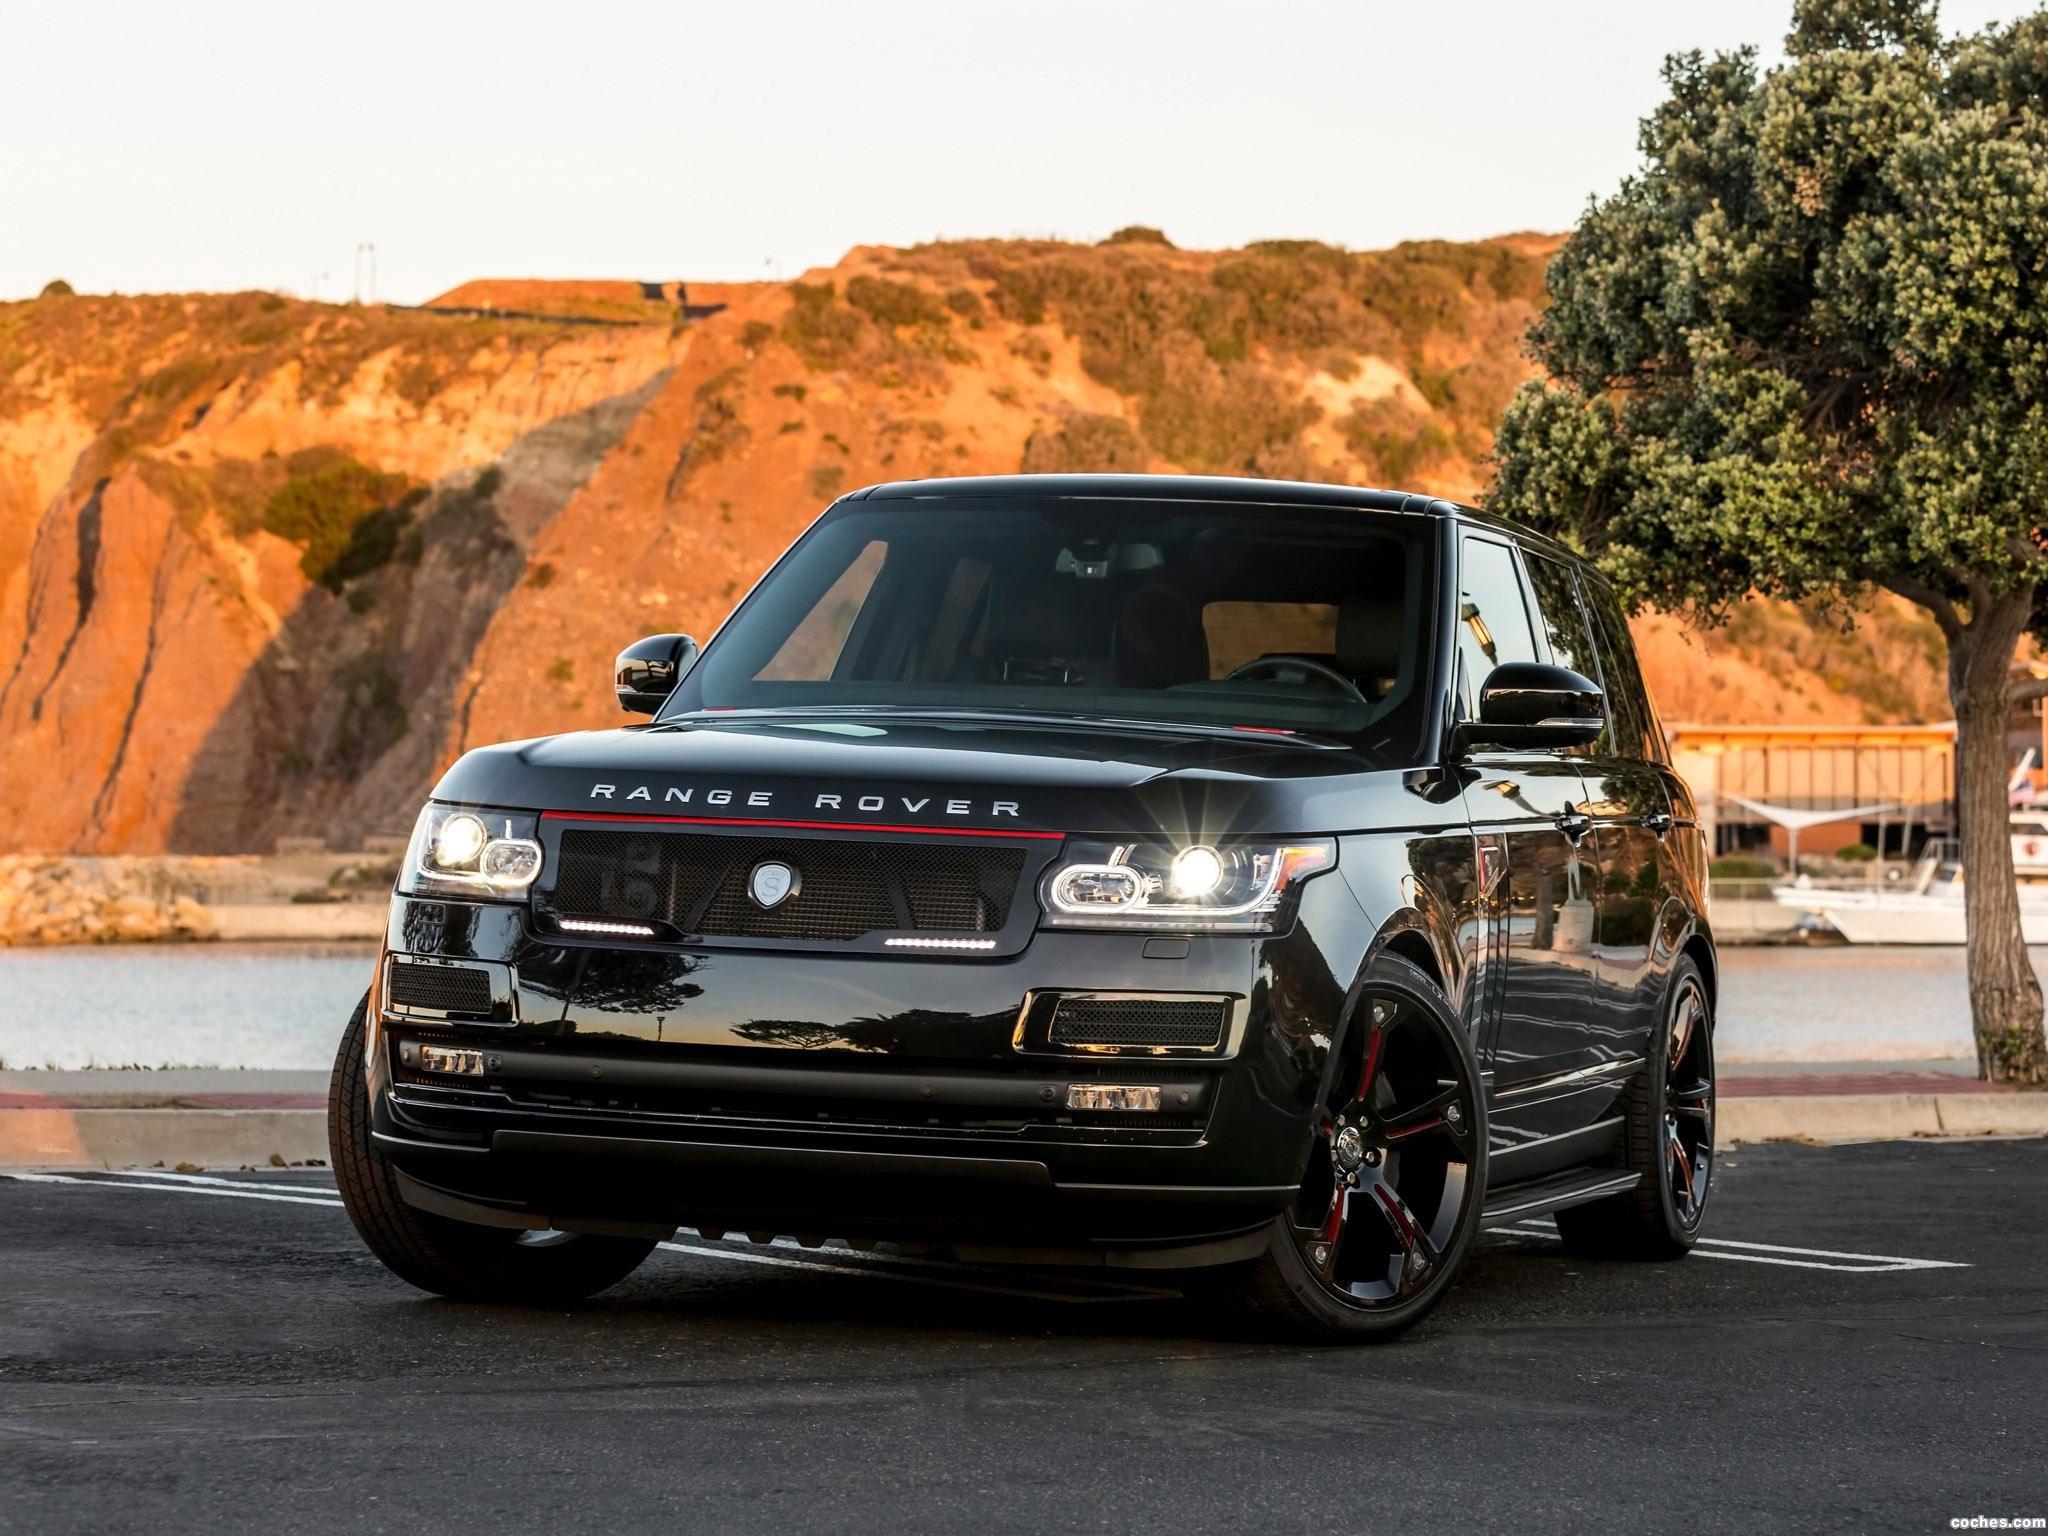 strut_land-rover-range-rover-2015_r19.jpg